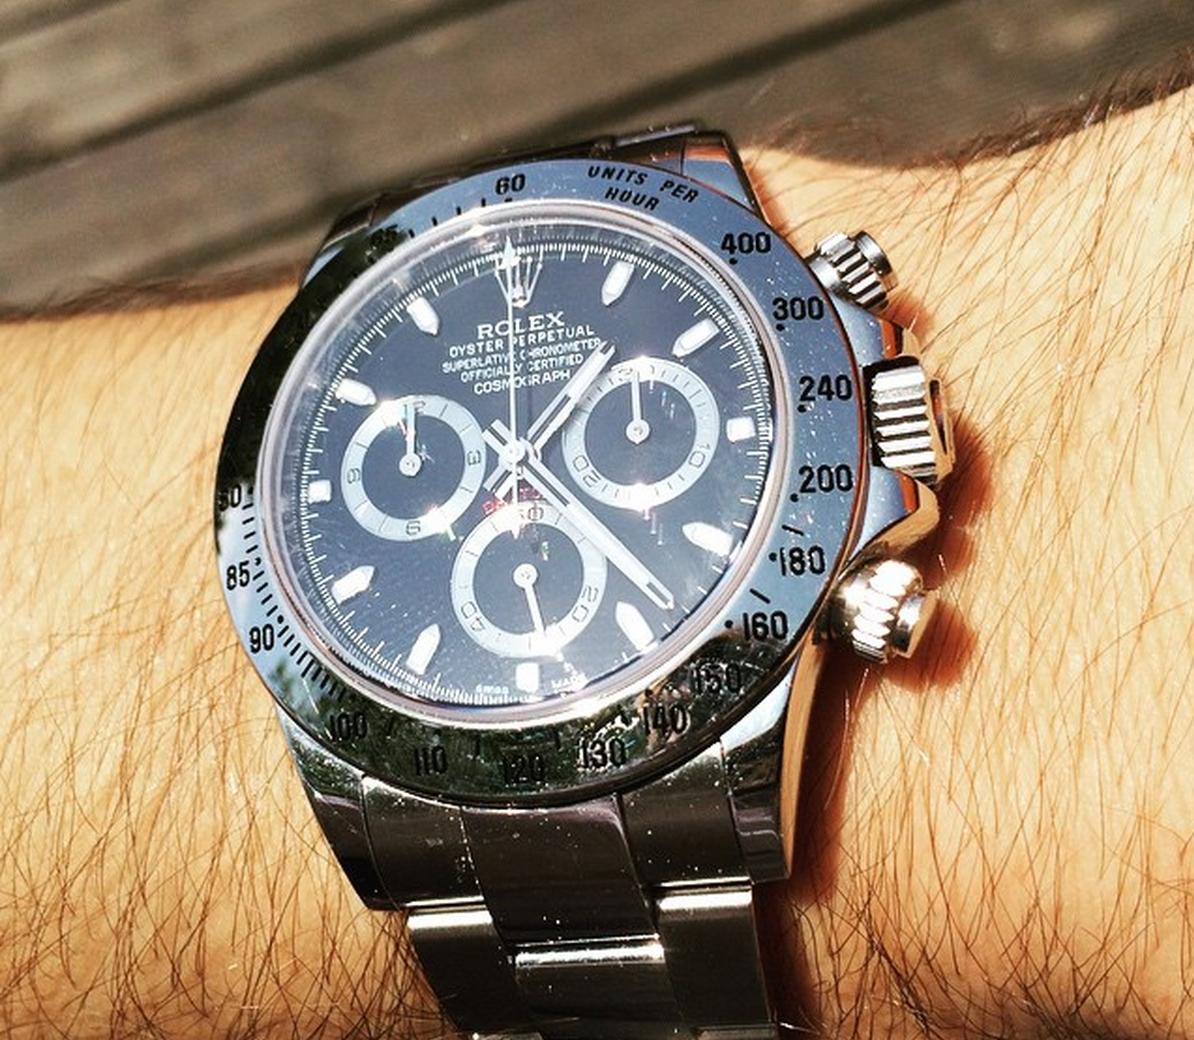 Rolex Daytona Chronograph COSC